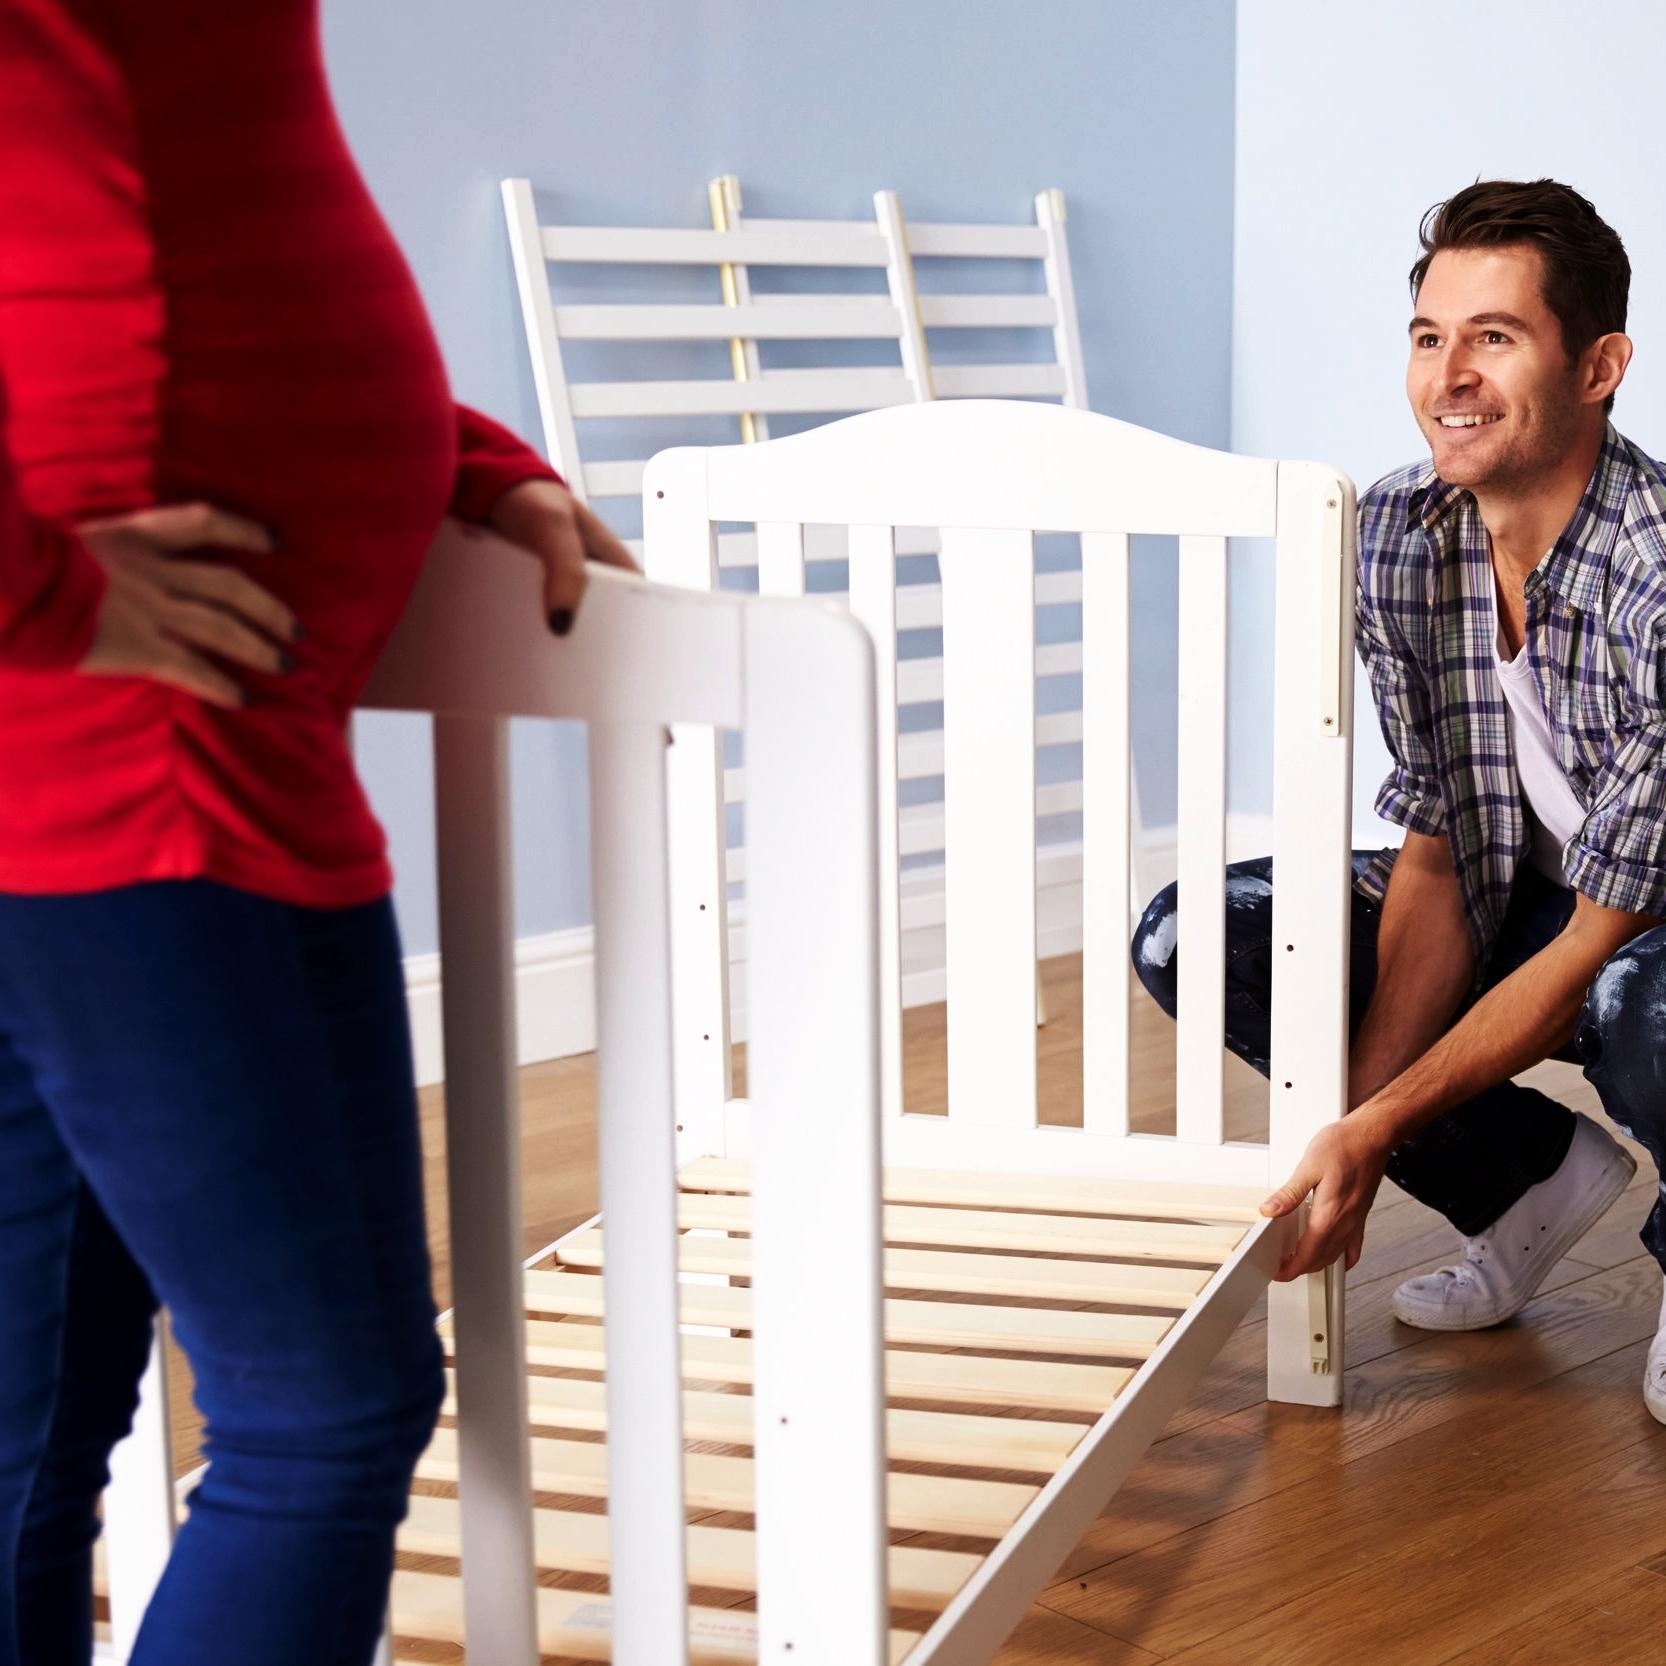 Assembling a crib